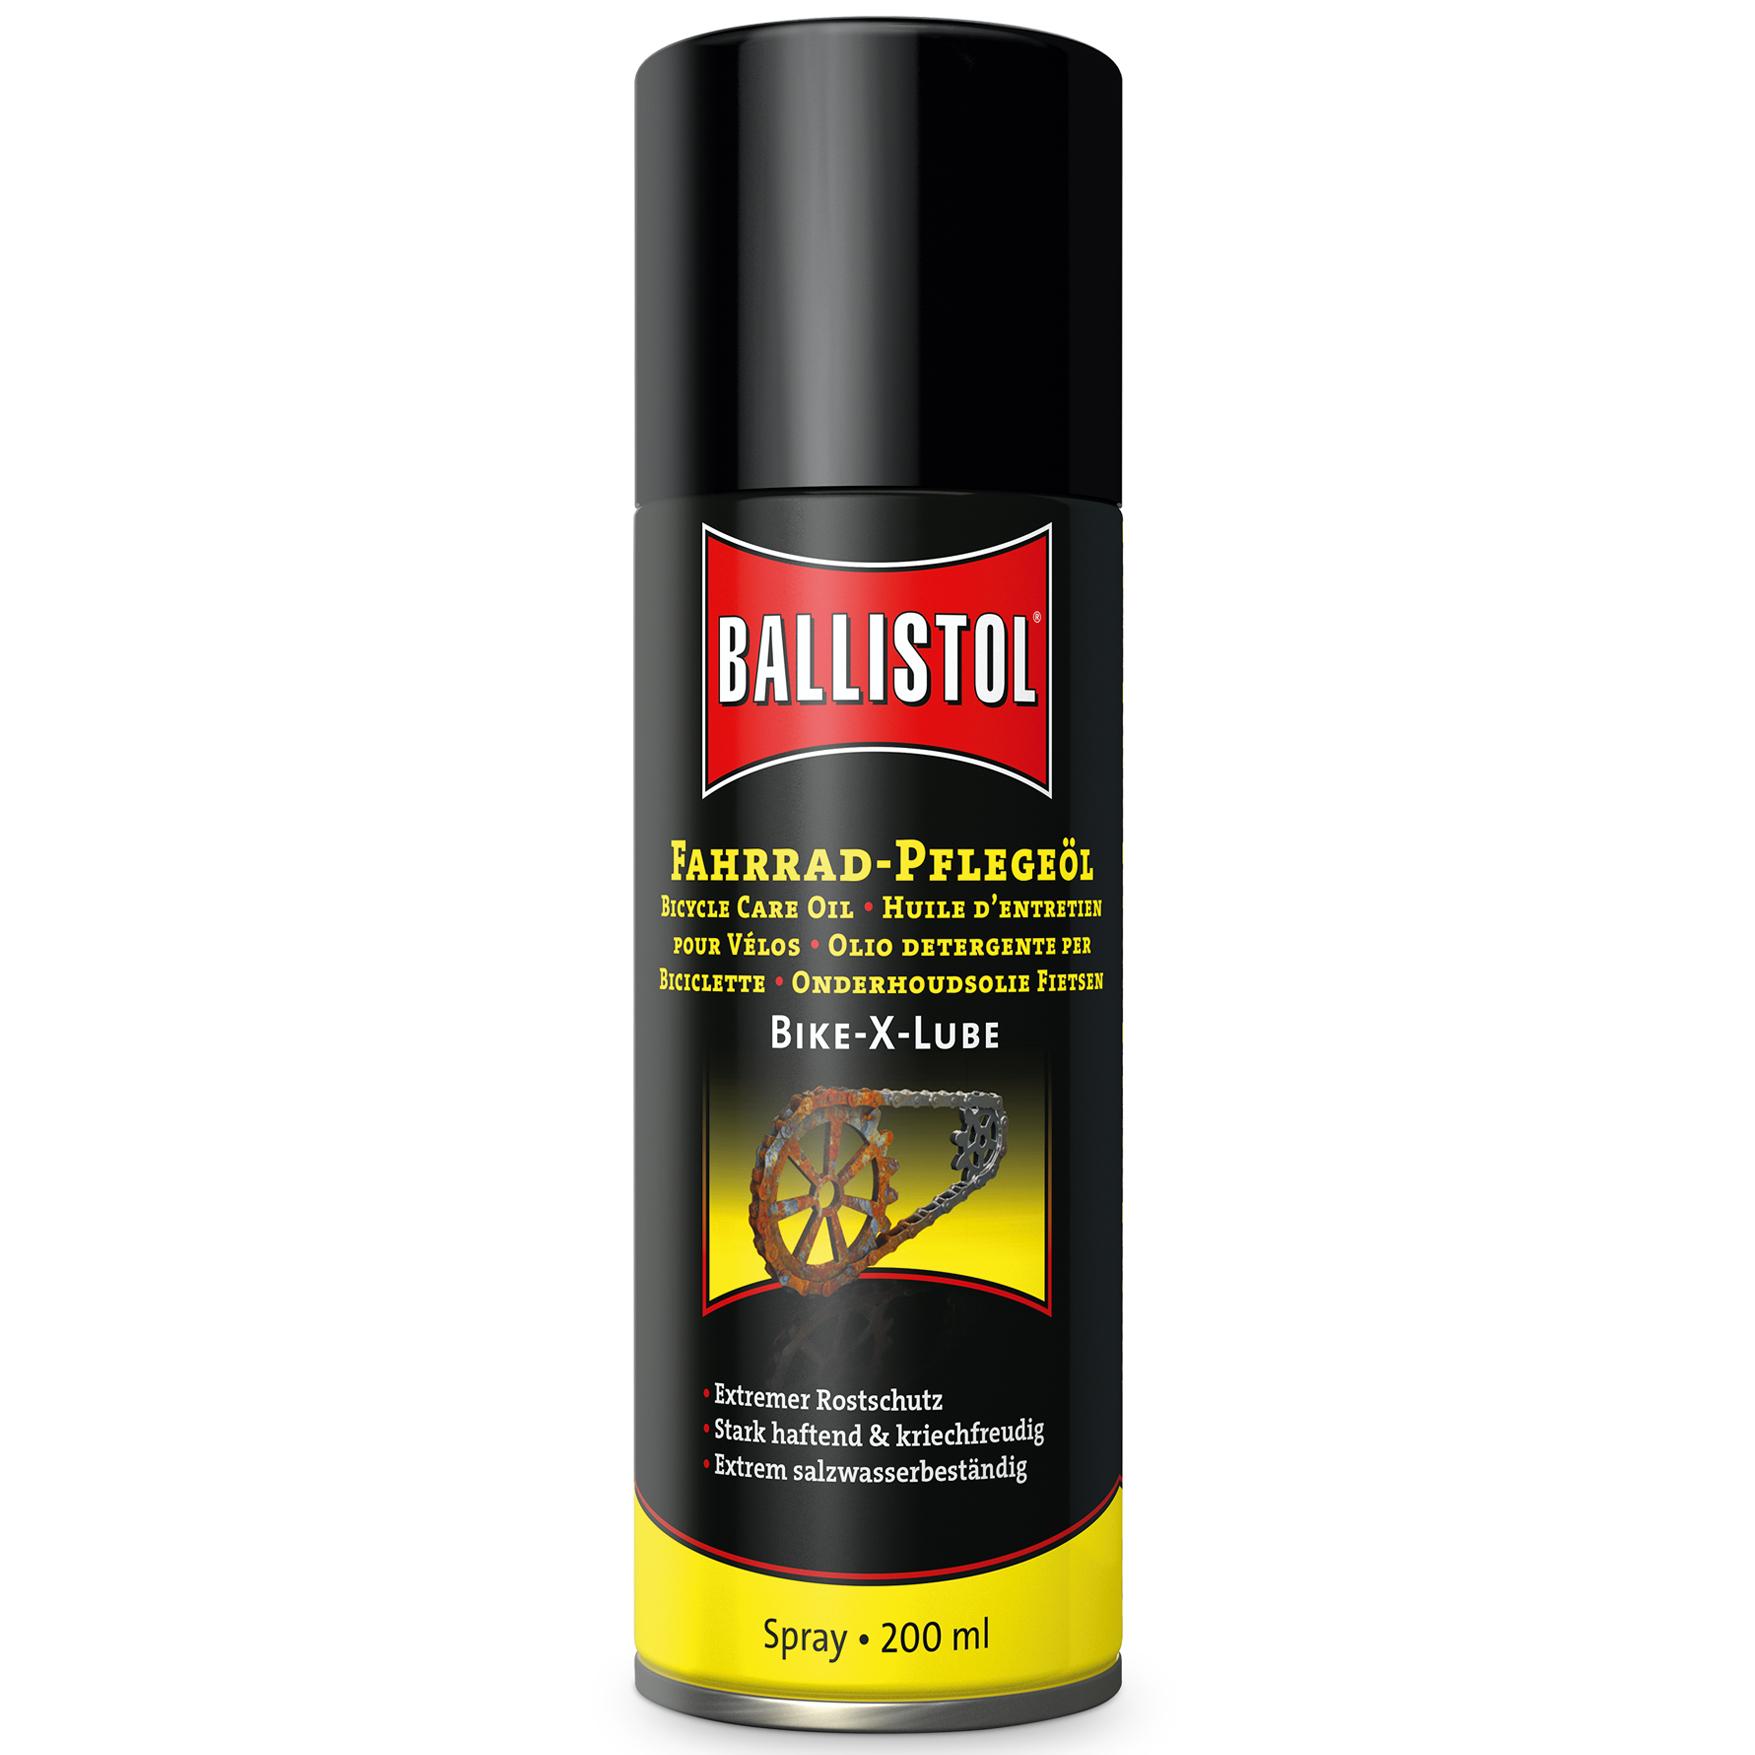 Ballistol Bike-X-Lube Bike Care Oil - Spray 200ml